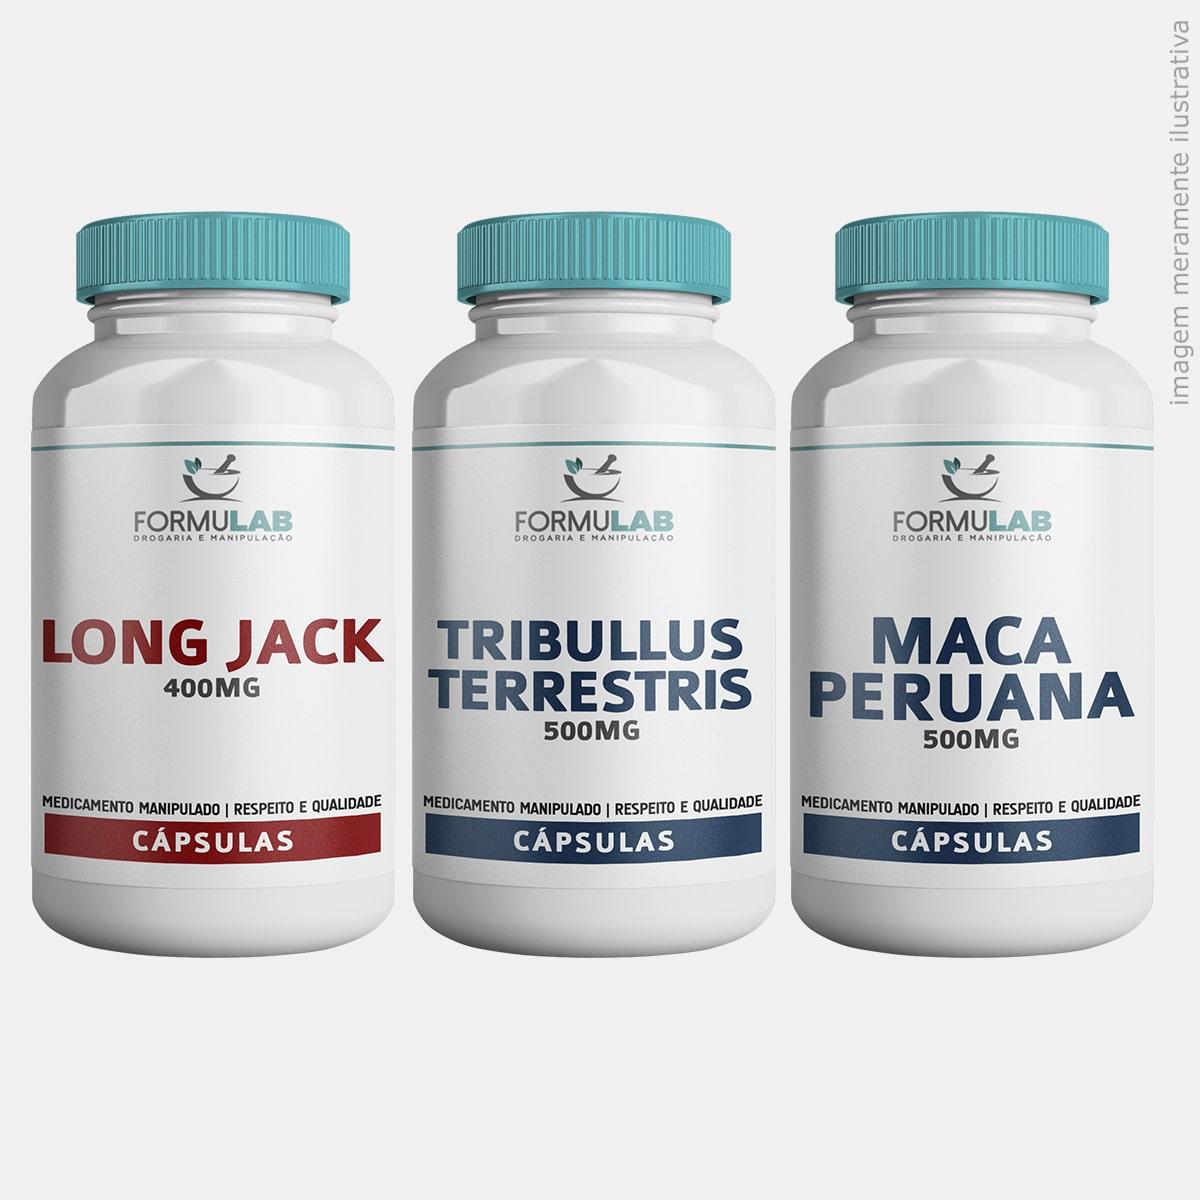 Kit DESEMPENHO FÍSICO - Long Jack 400mg + Tribullus Terrestris 500mg + Maca peruana 500mg